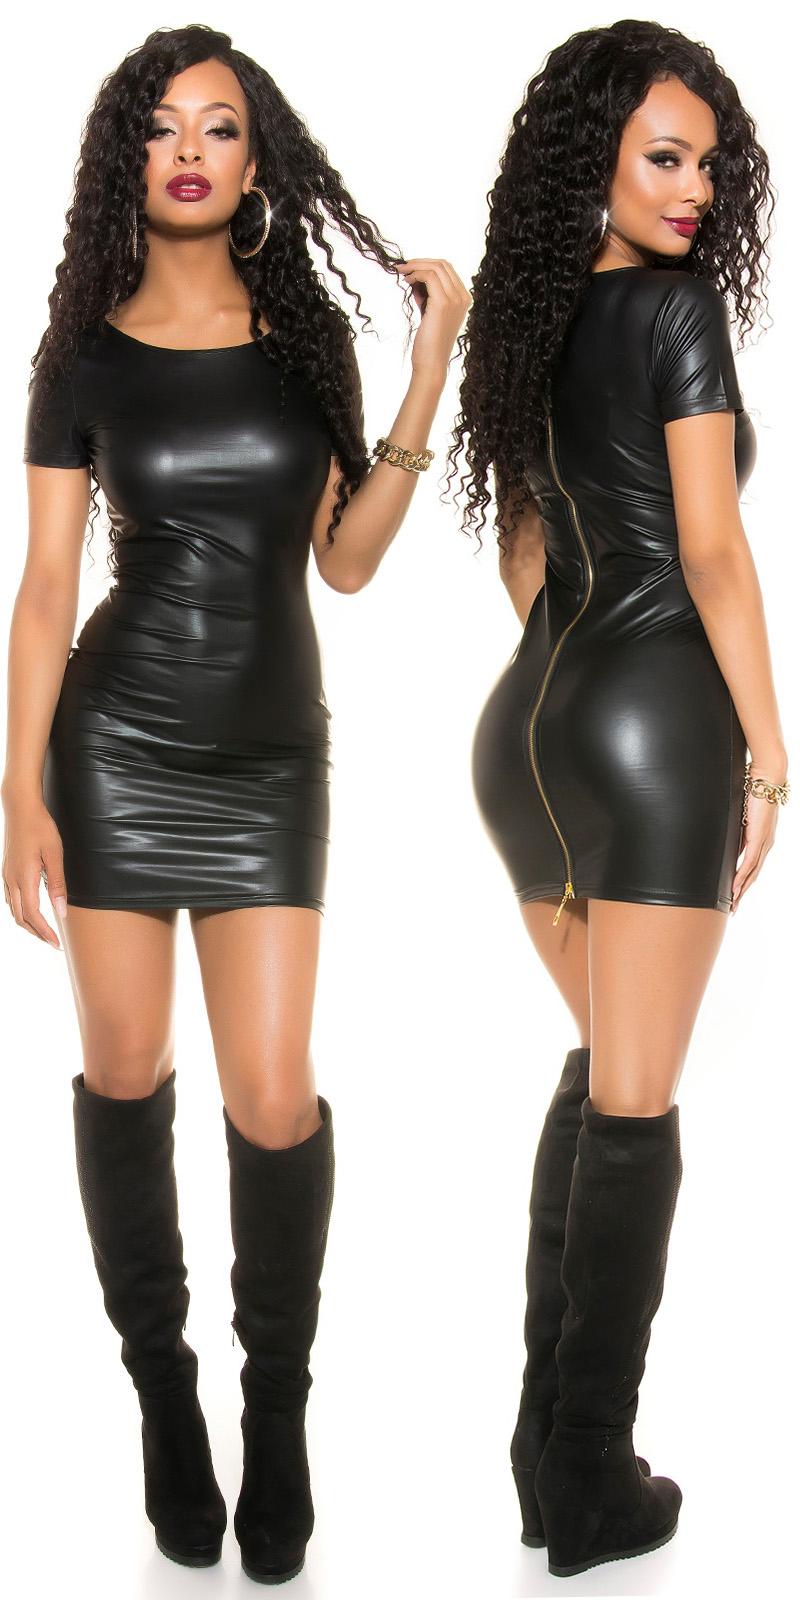 Rochii mini sexy aspect lucios cu 2Way fermoar